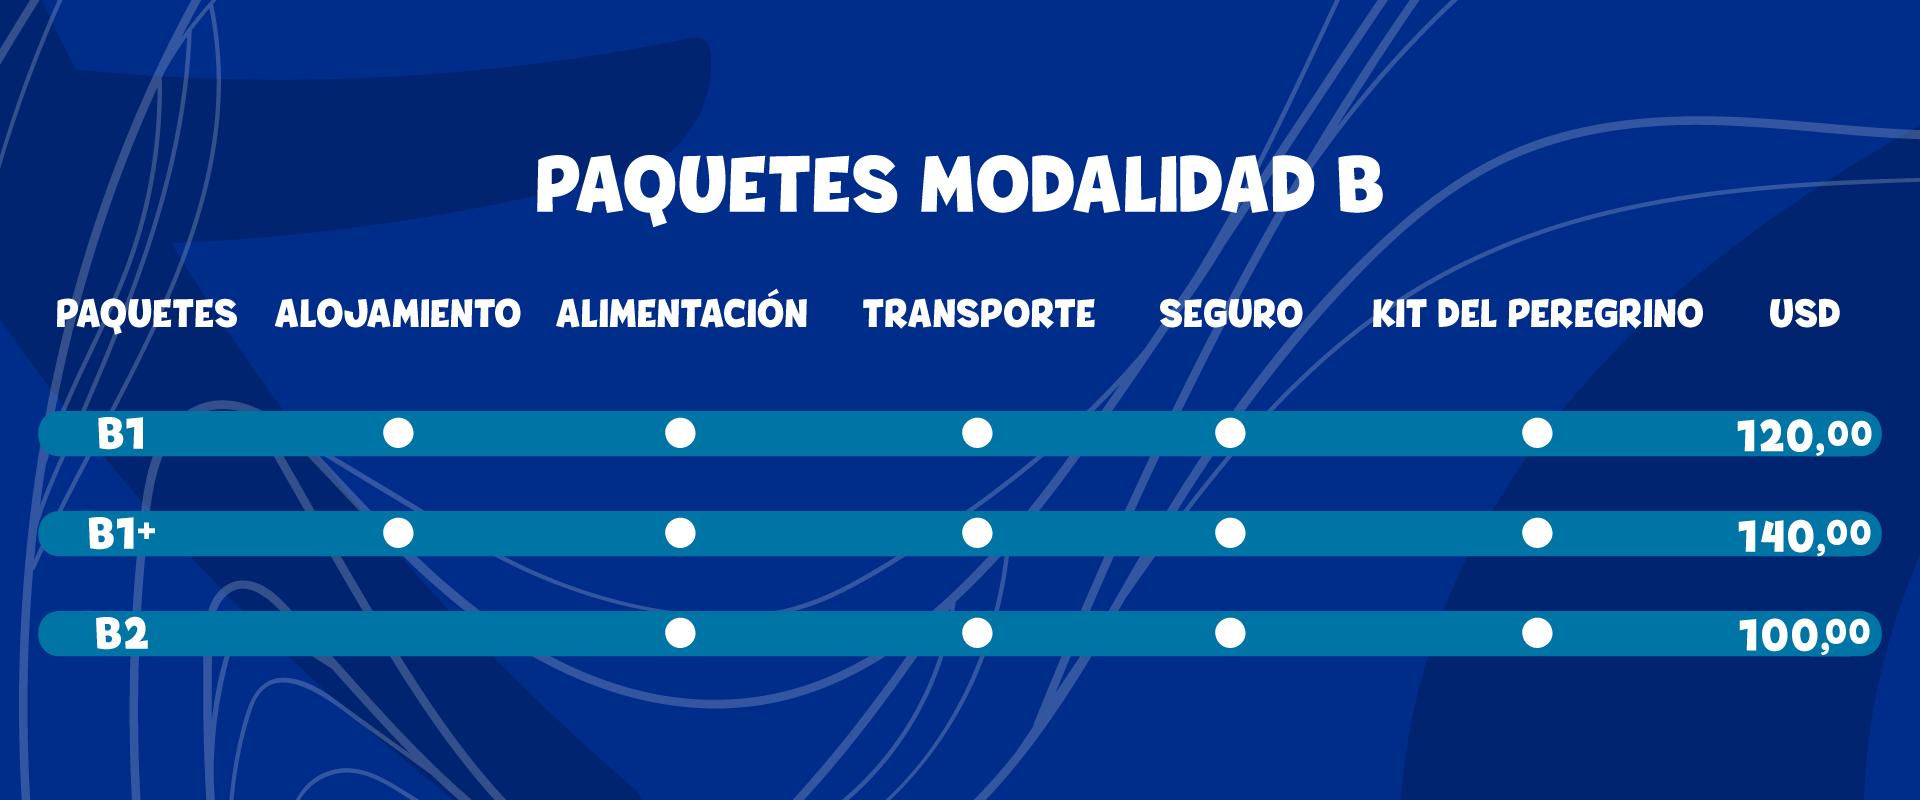 ES-PAQUETES-DEL-PEREGRINO-B-CORREGIDO (1)